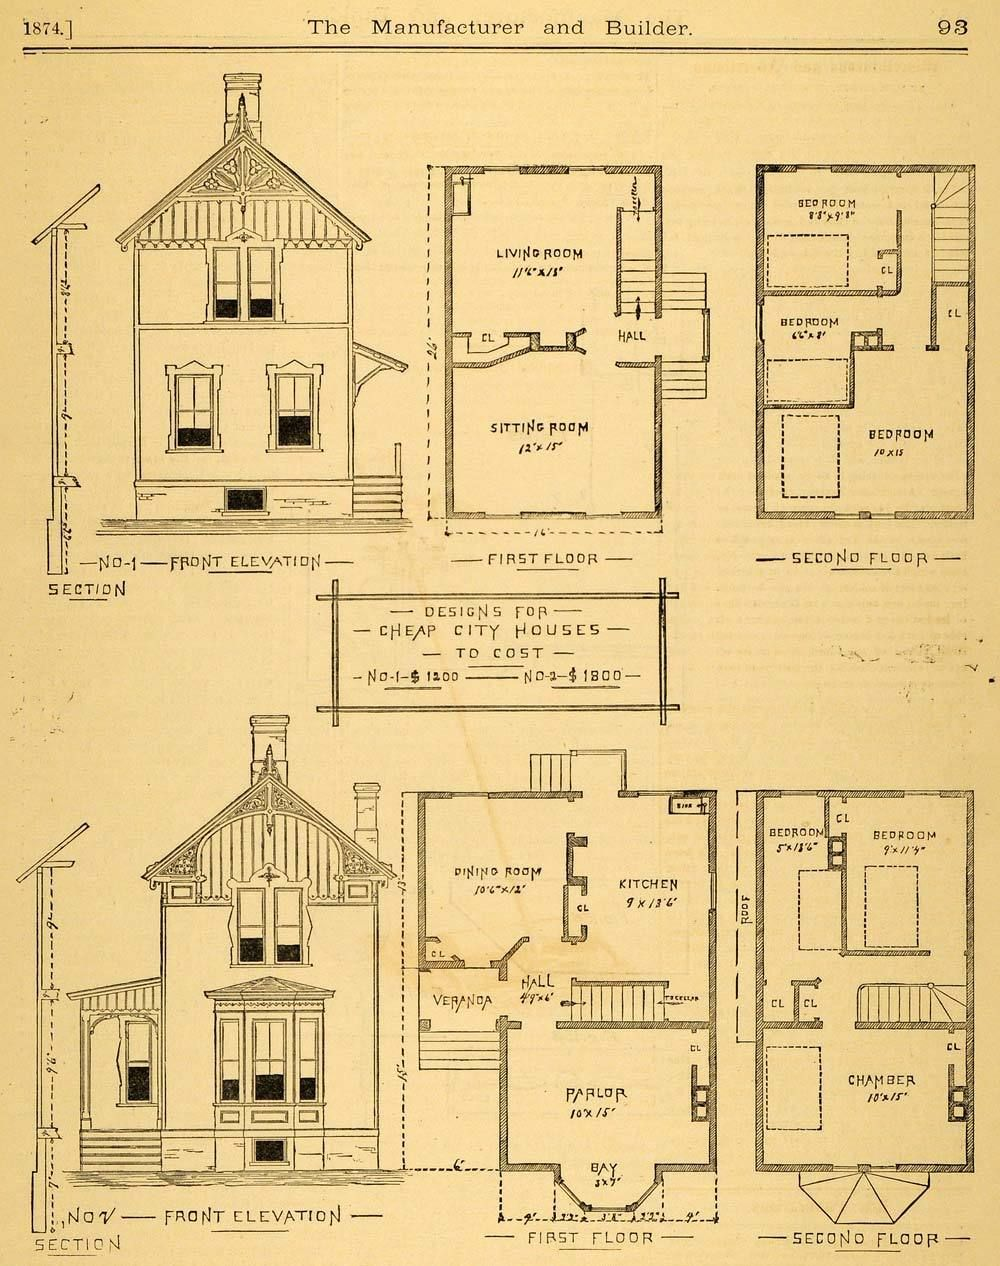 1874 Print City House Architectural Design Floor Plans Victorian Mab1 Floor Plan Design City House Victorian House Plans